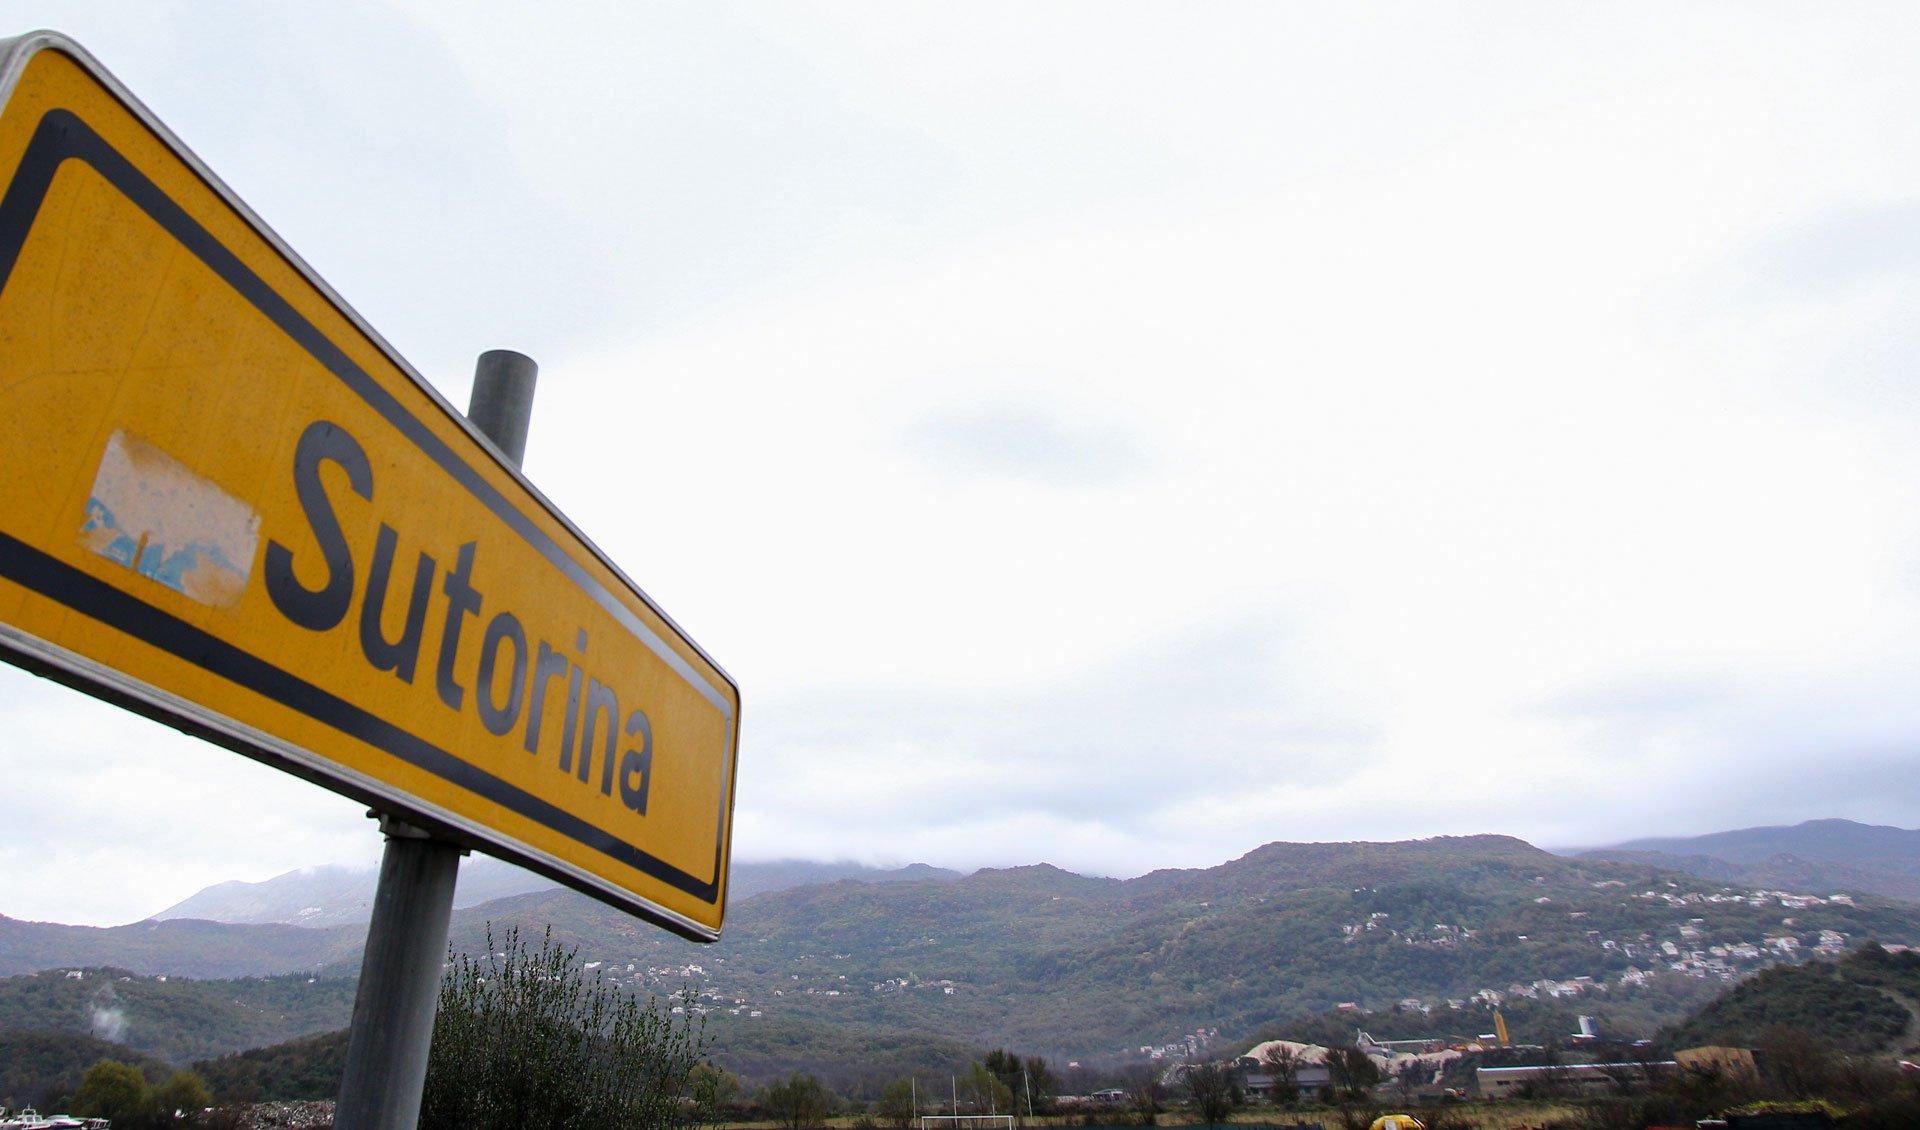 Border issue on Sutorine terminated, Montenegro sends ambassador to Bosnia and Herzegovina